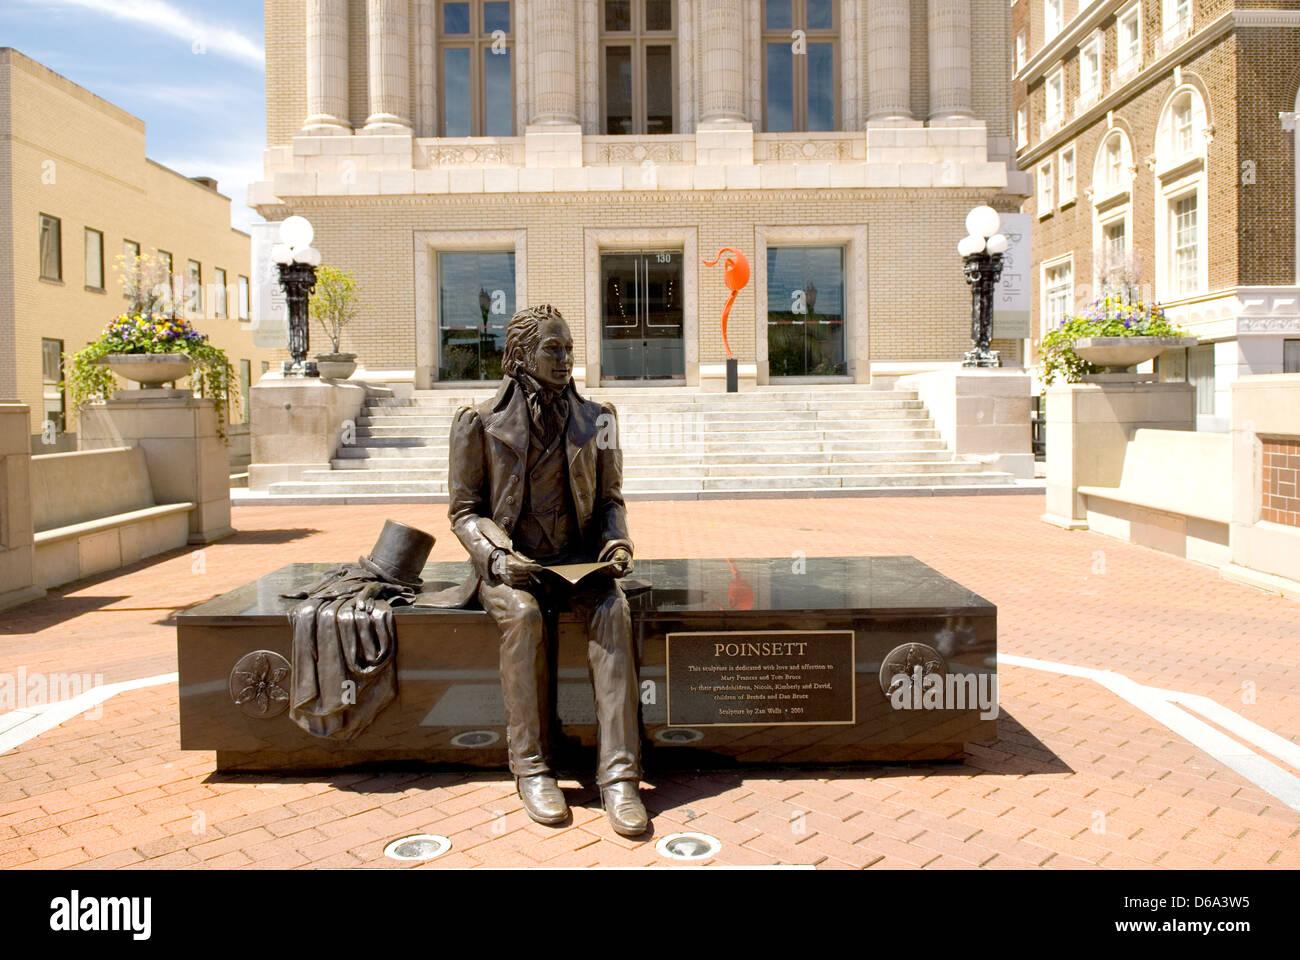 Joel Poinsett statue Greenville SC USA - Stock Image